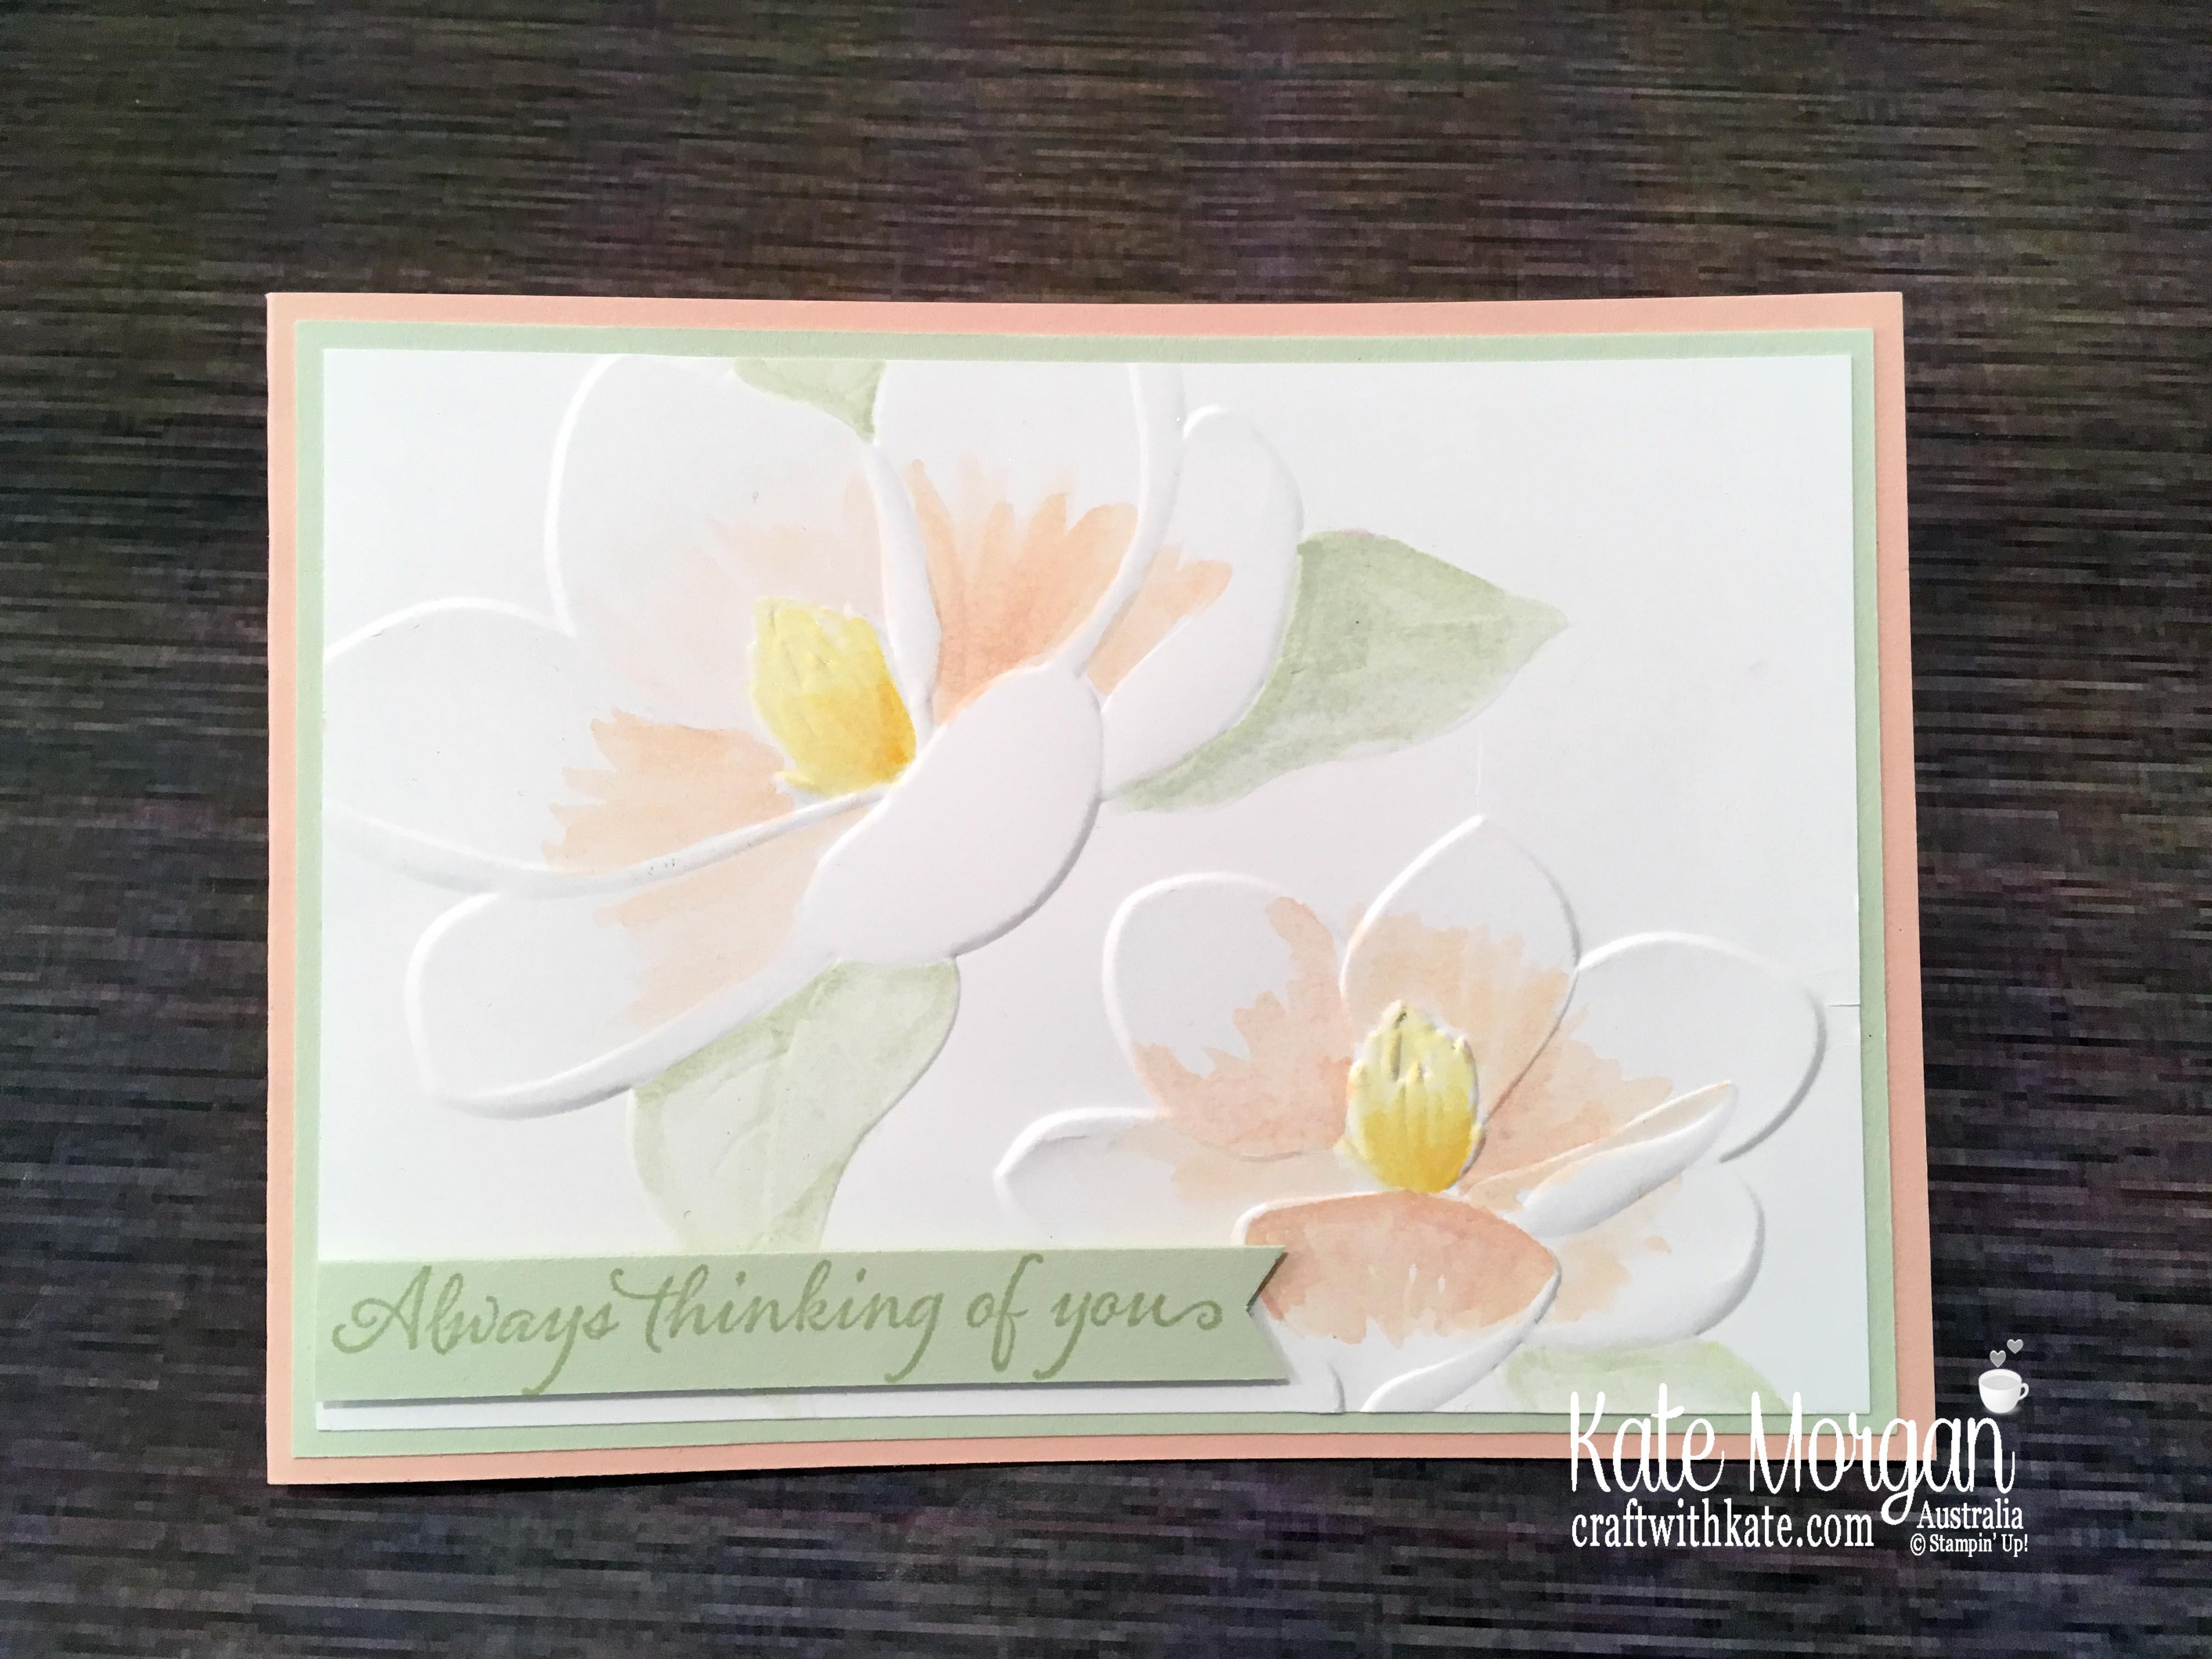 Magnolia Blooms watercolour, Stampin Up by Kate Morgan, Australia 2019